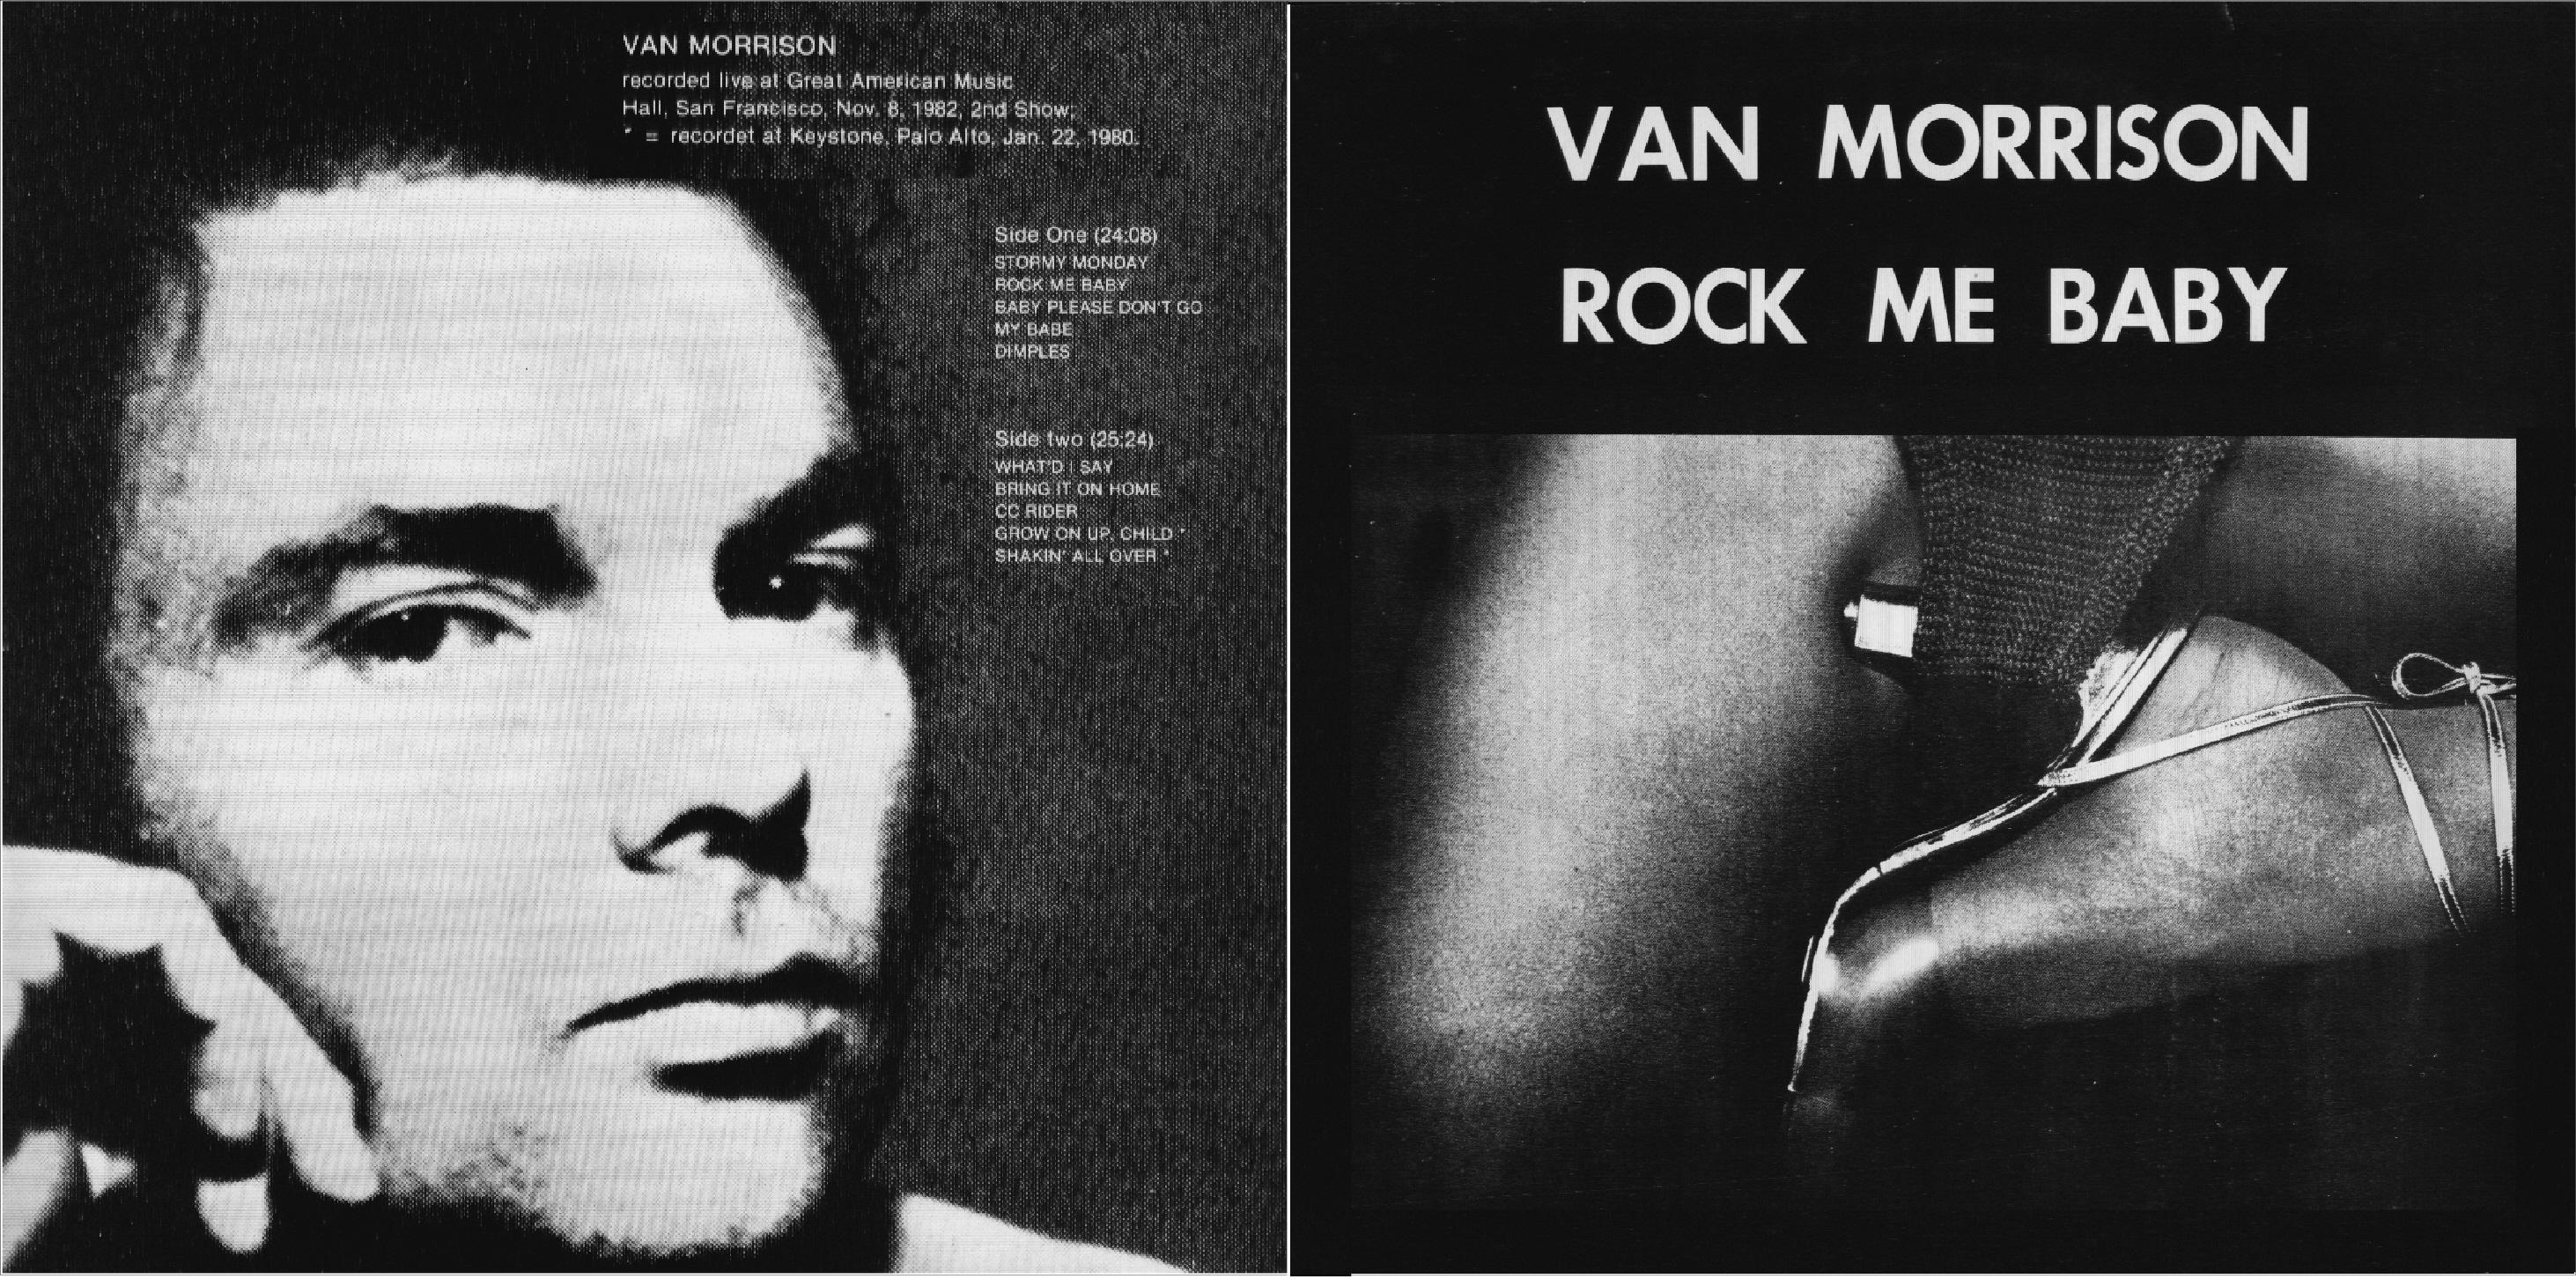 VanMorrison1982-11-08RockMeBabyVinylGreatAmericanMusicHallSanFranciscoCA.jpg